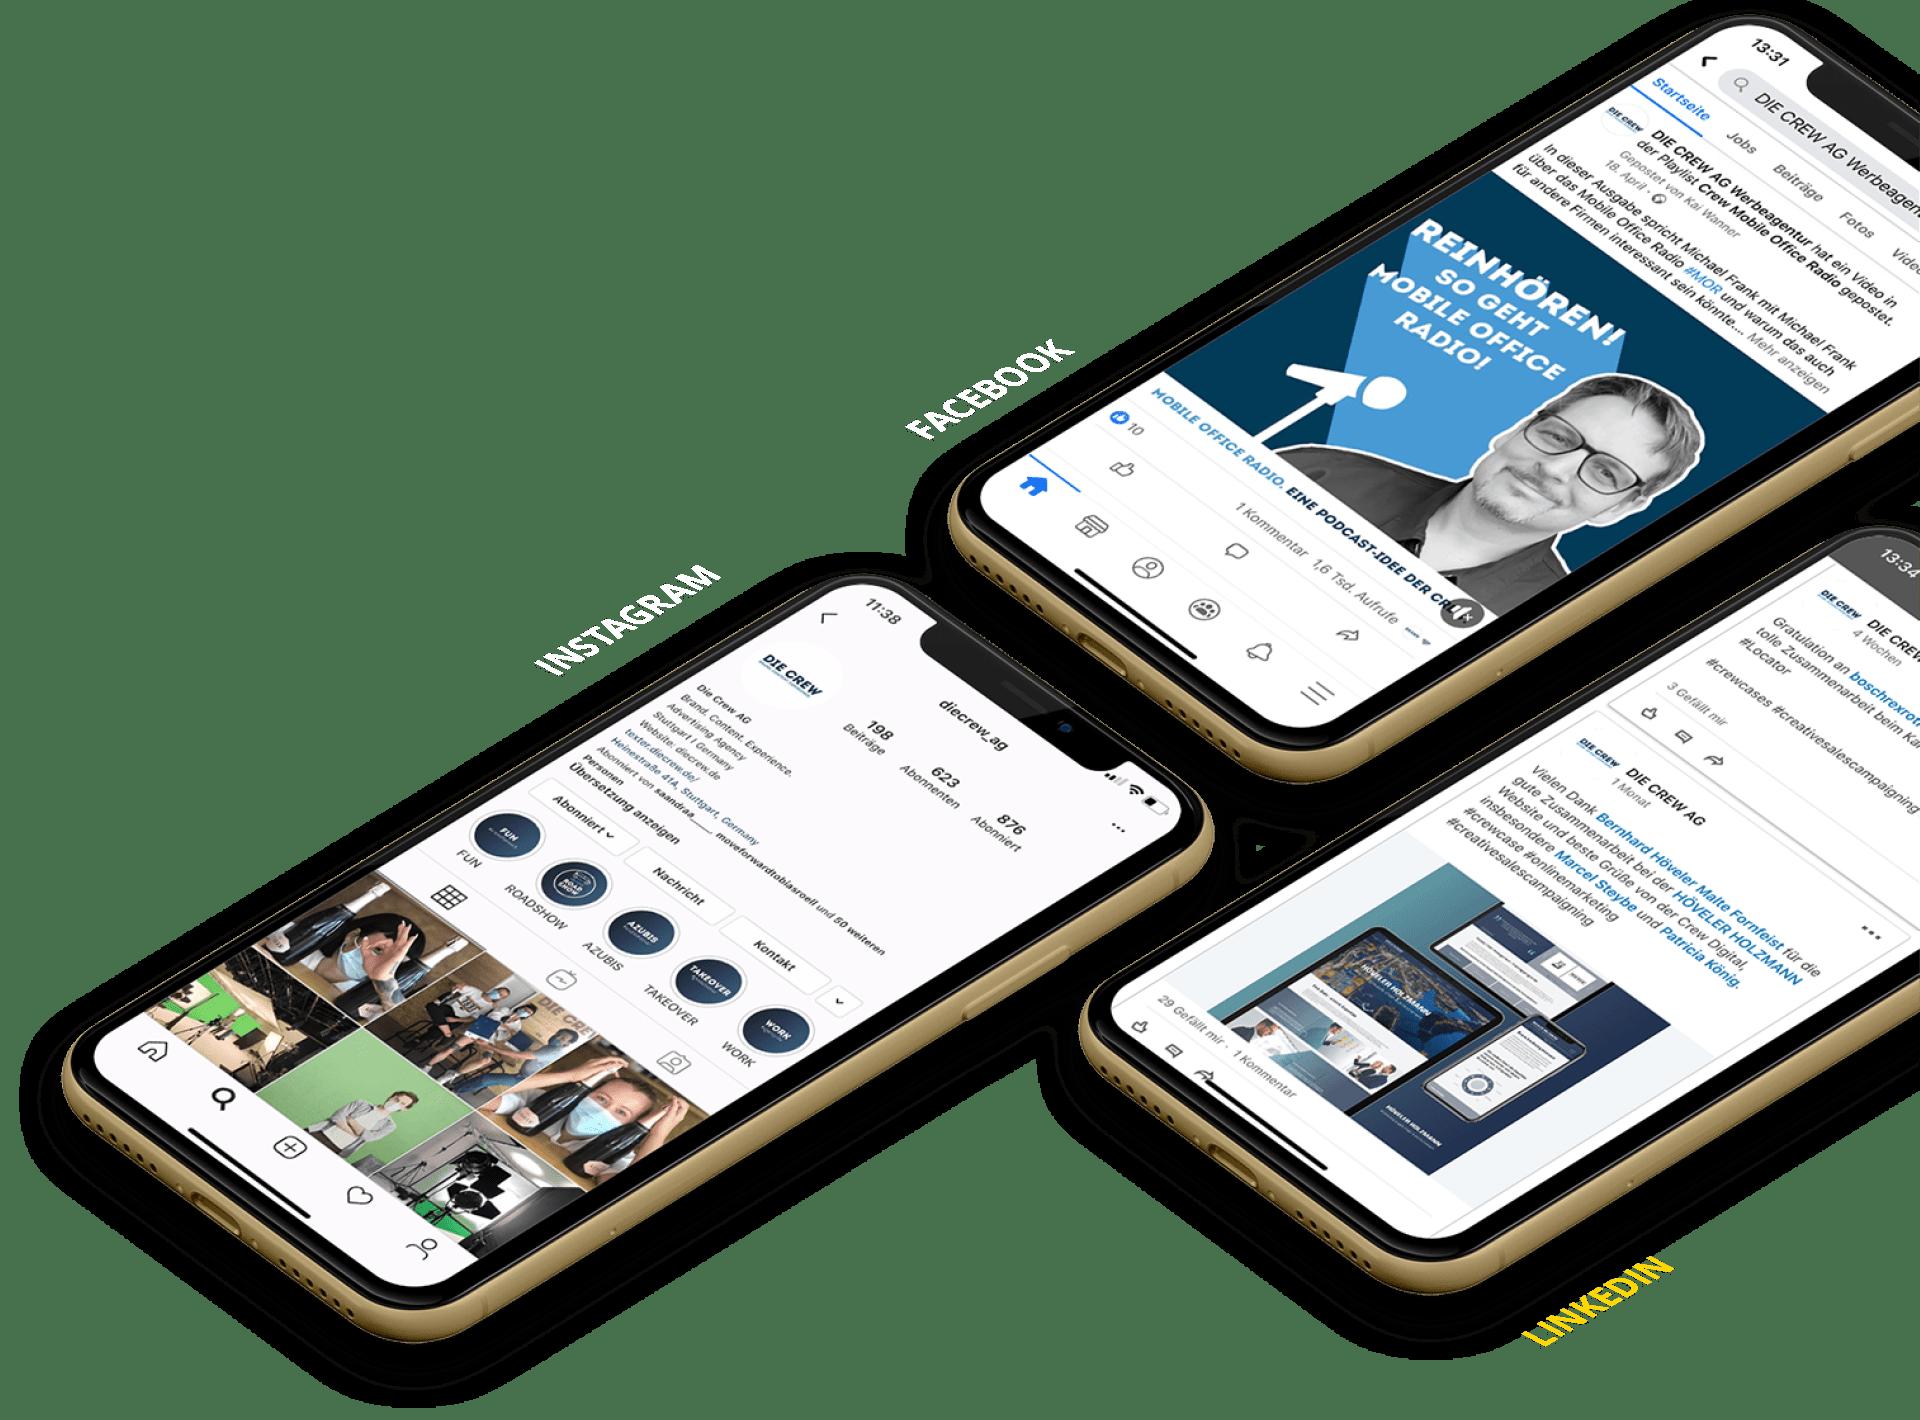 social media kanäle einer marketingagentur